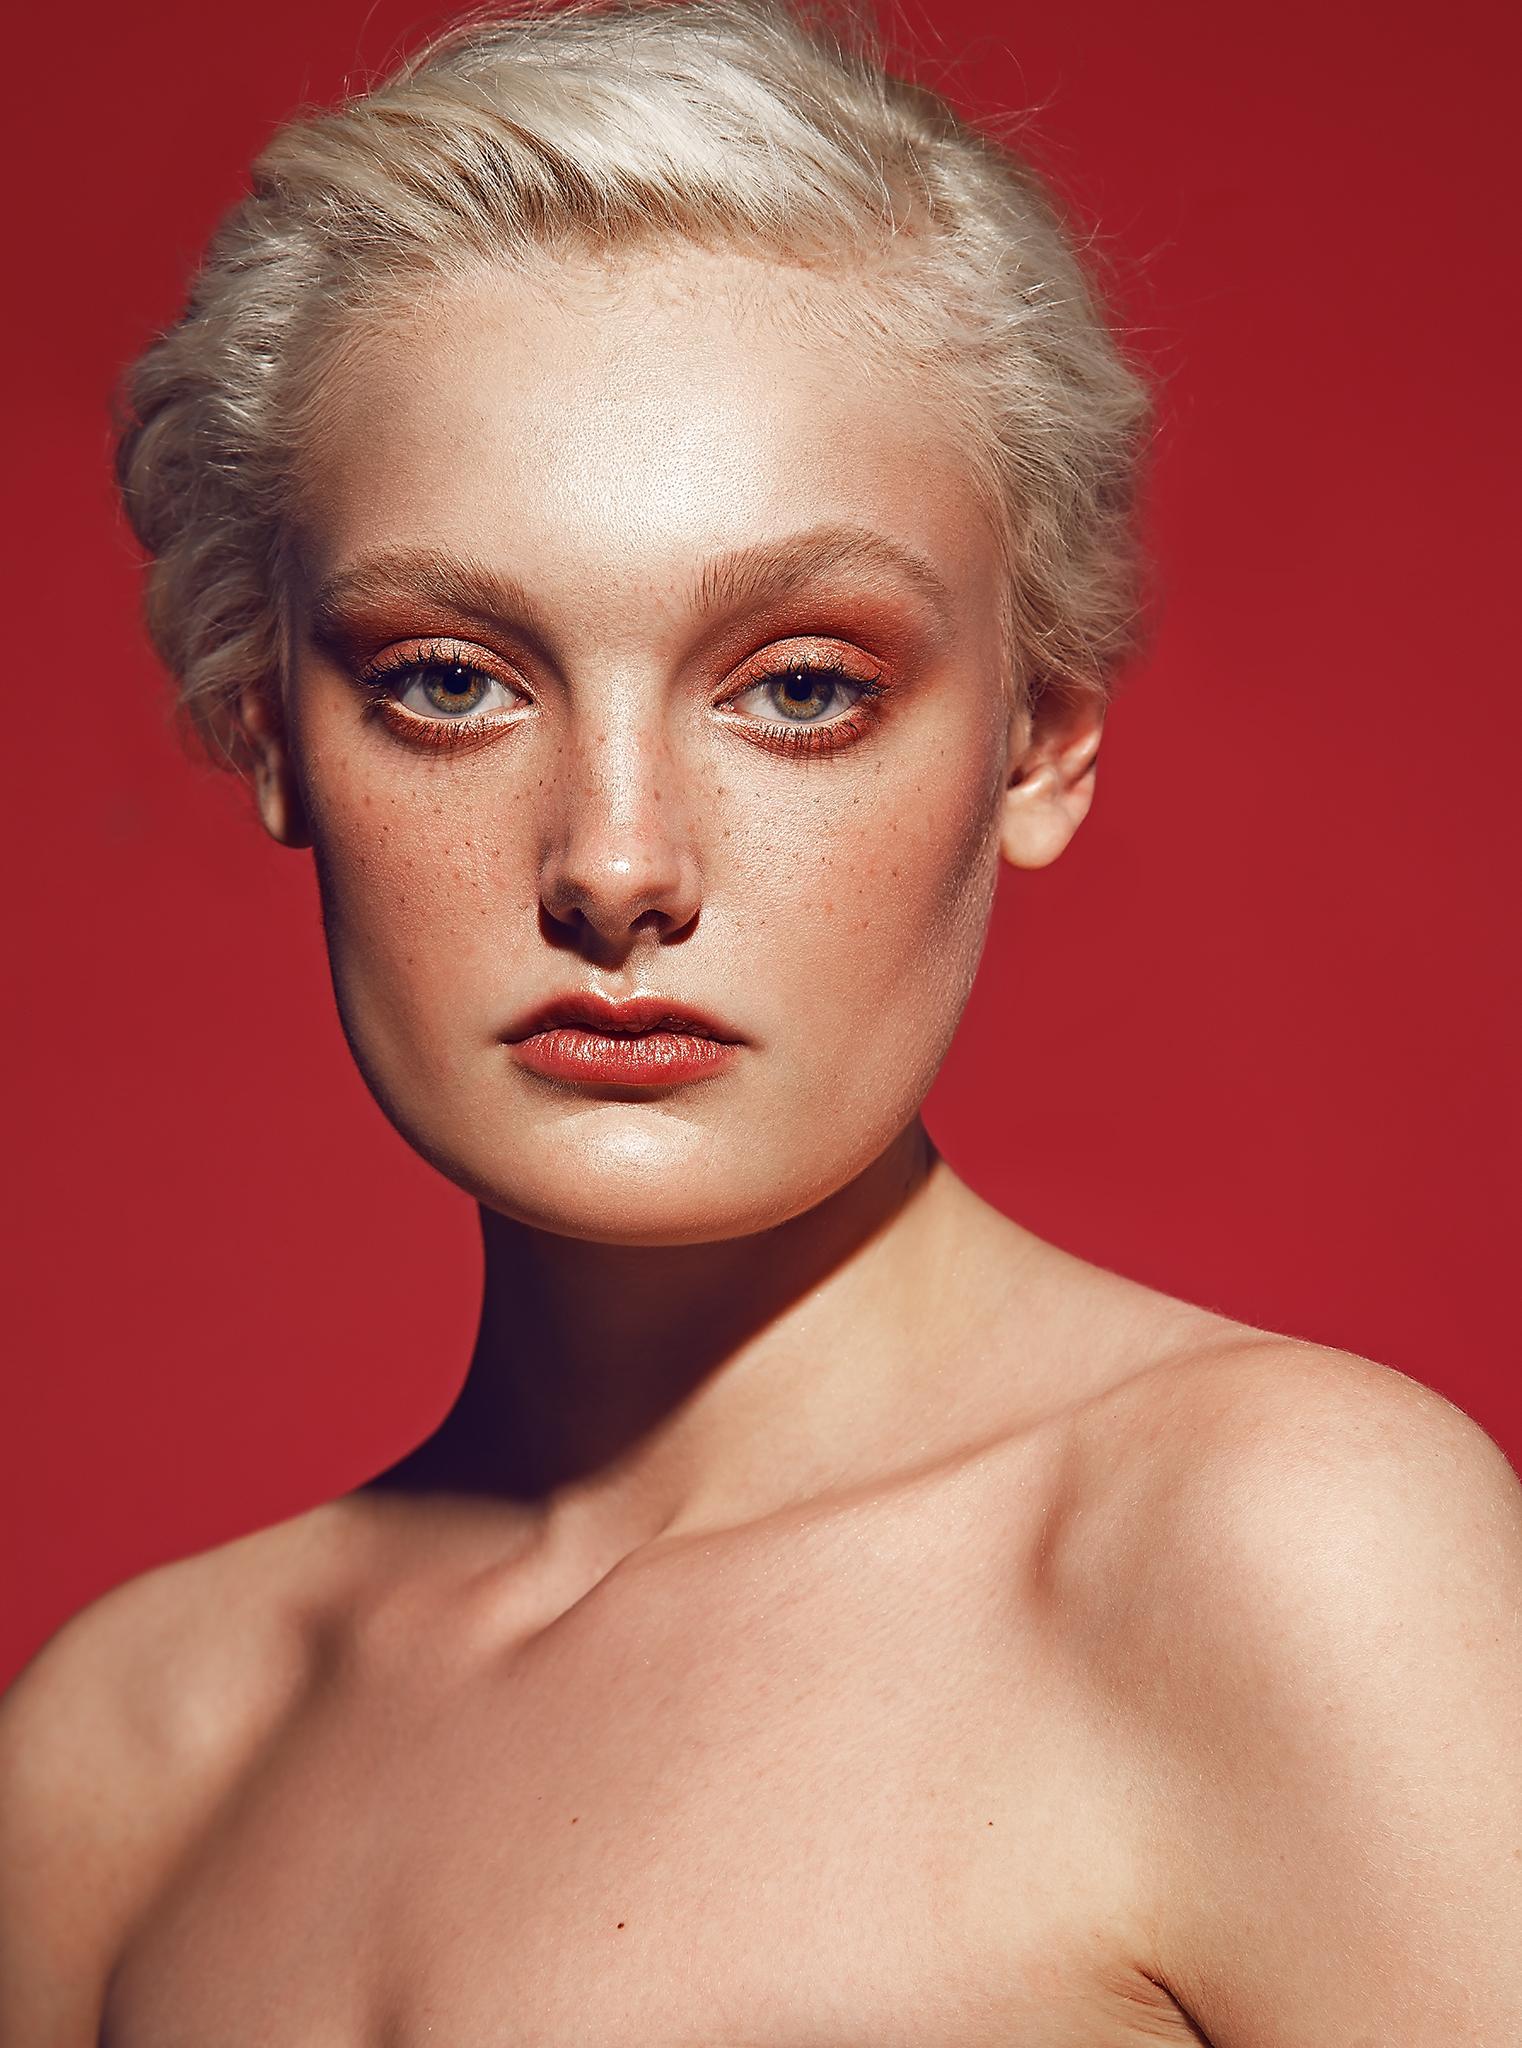 Beauty-Photography-by-beauty-Photographer-Dana-Cole-Red-makeup-fashion-model-heartbreak-models-profoto-blonde-model-red-lips-beauty-photo-colorful-makeup.jpg